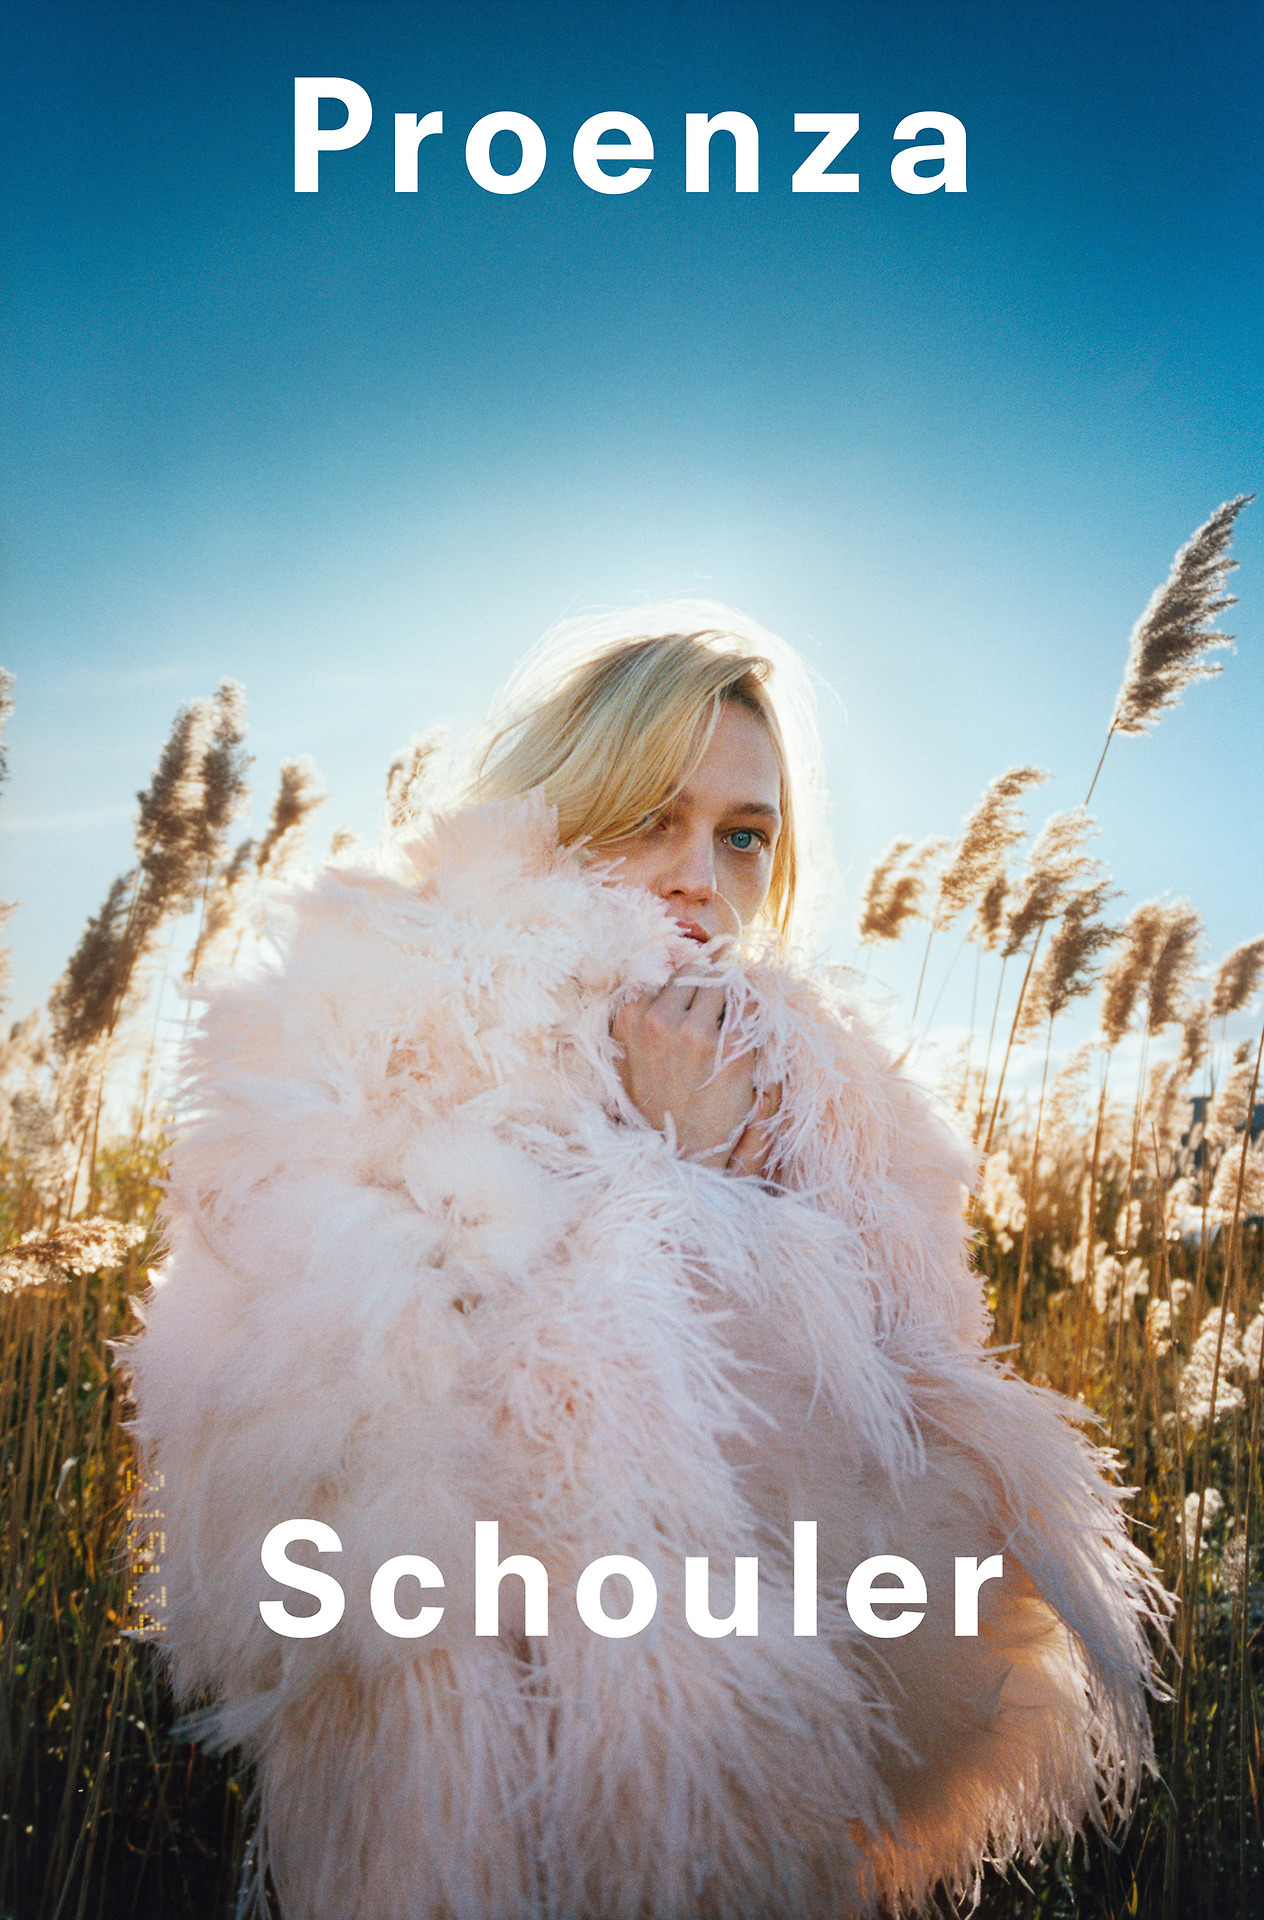 Sasha Pivovarova - Proenza Schouler Spring/Summer 2018